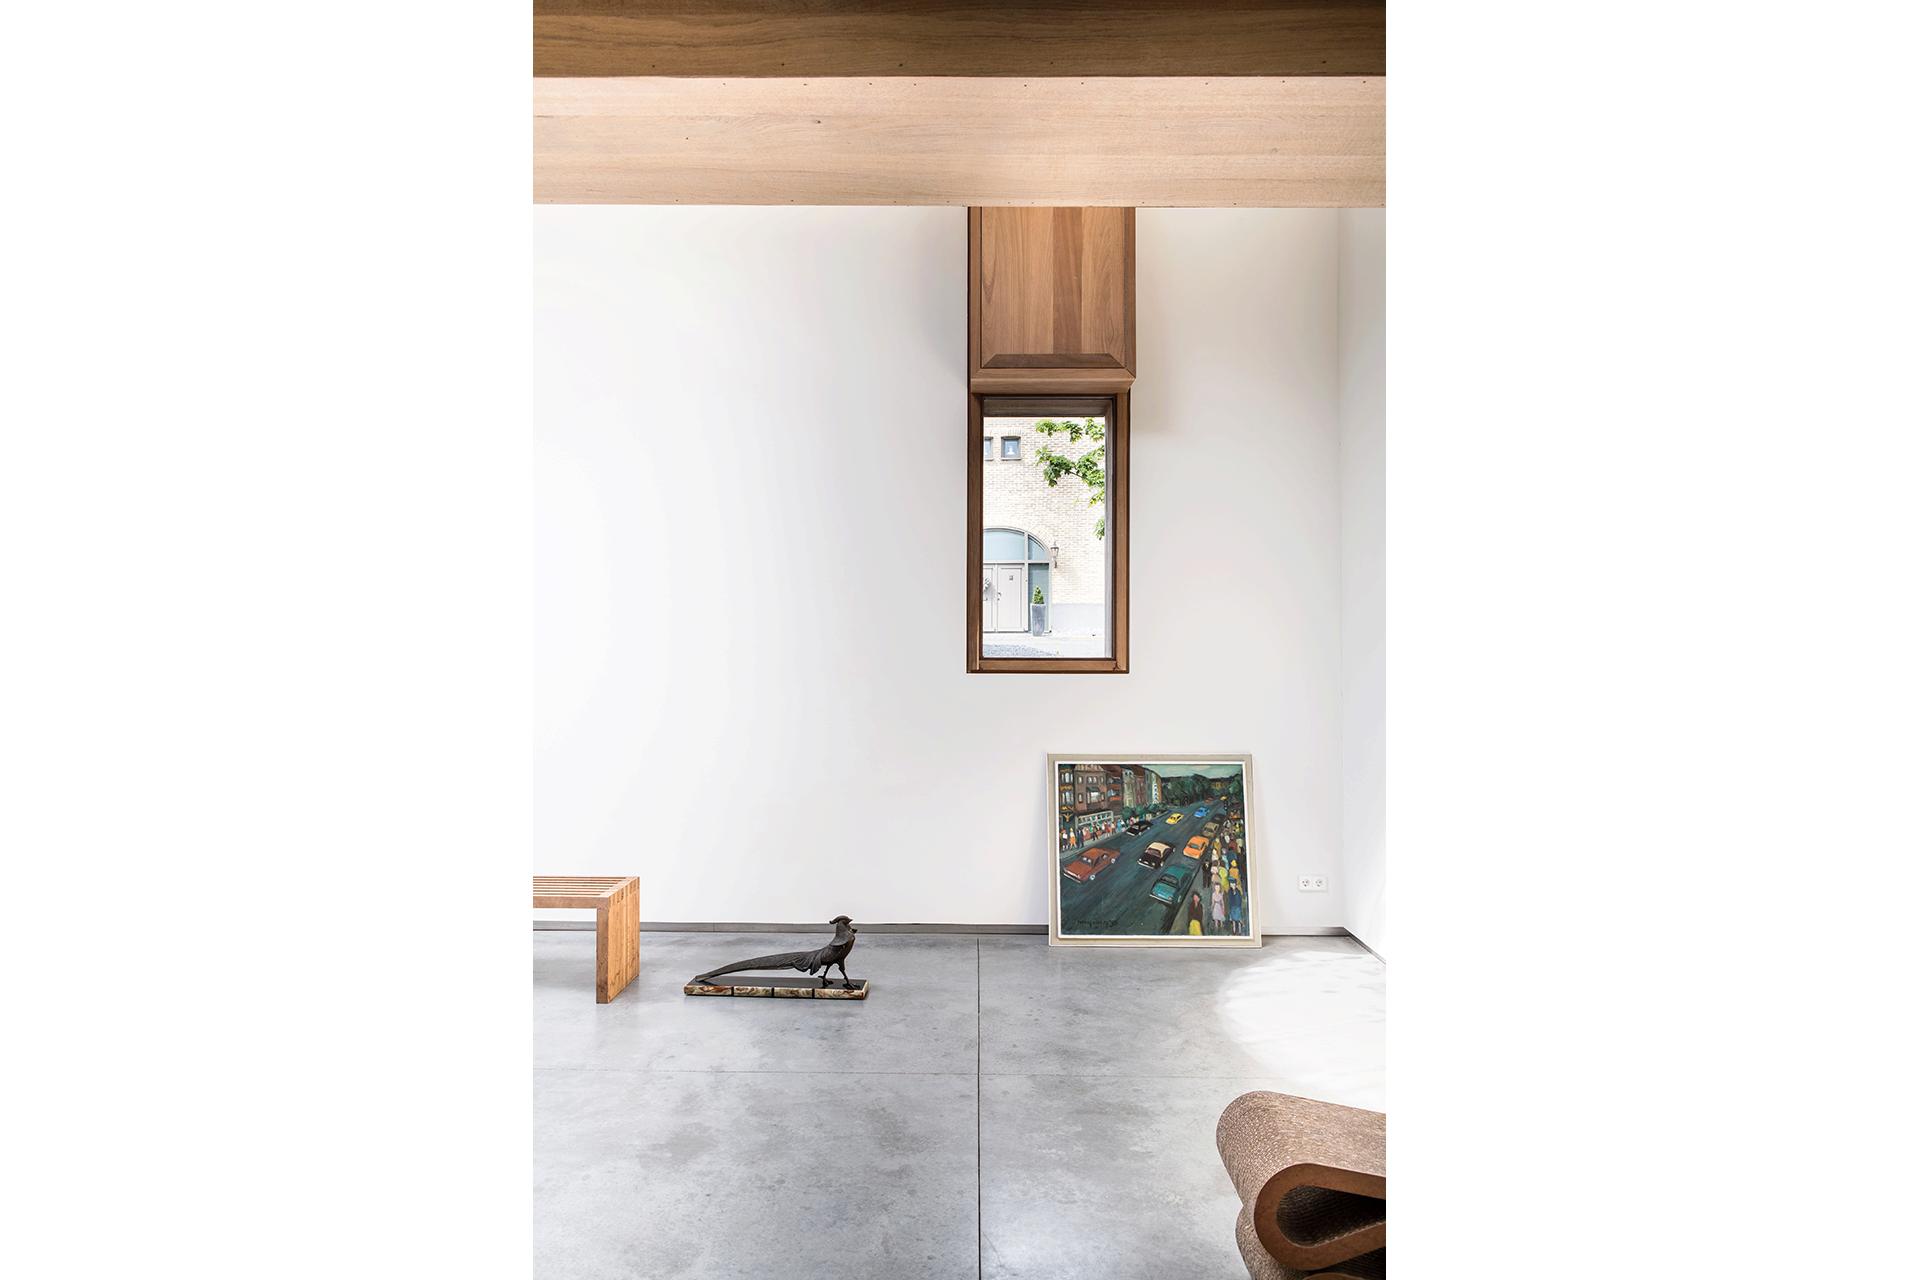 hout wit interieur raam raamkozijn beton vloer